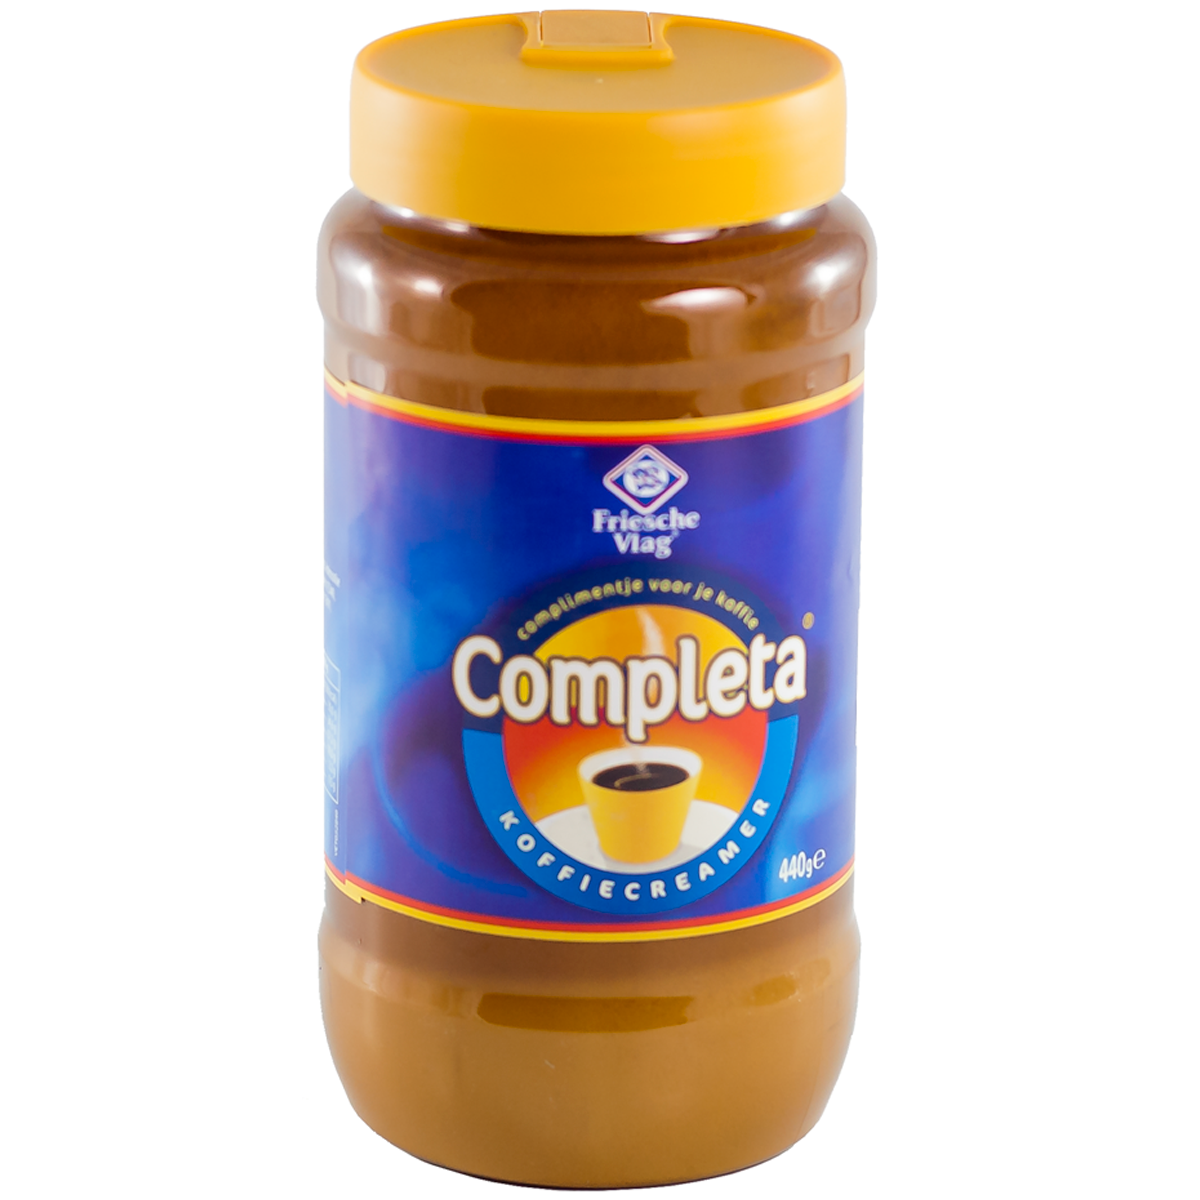 Completa Image